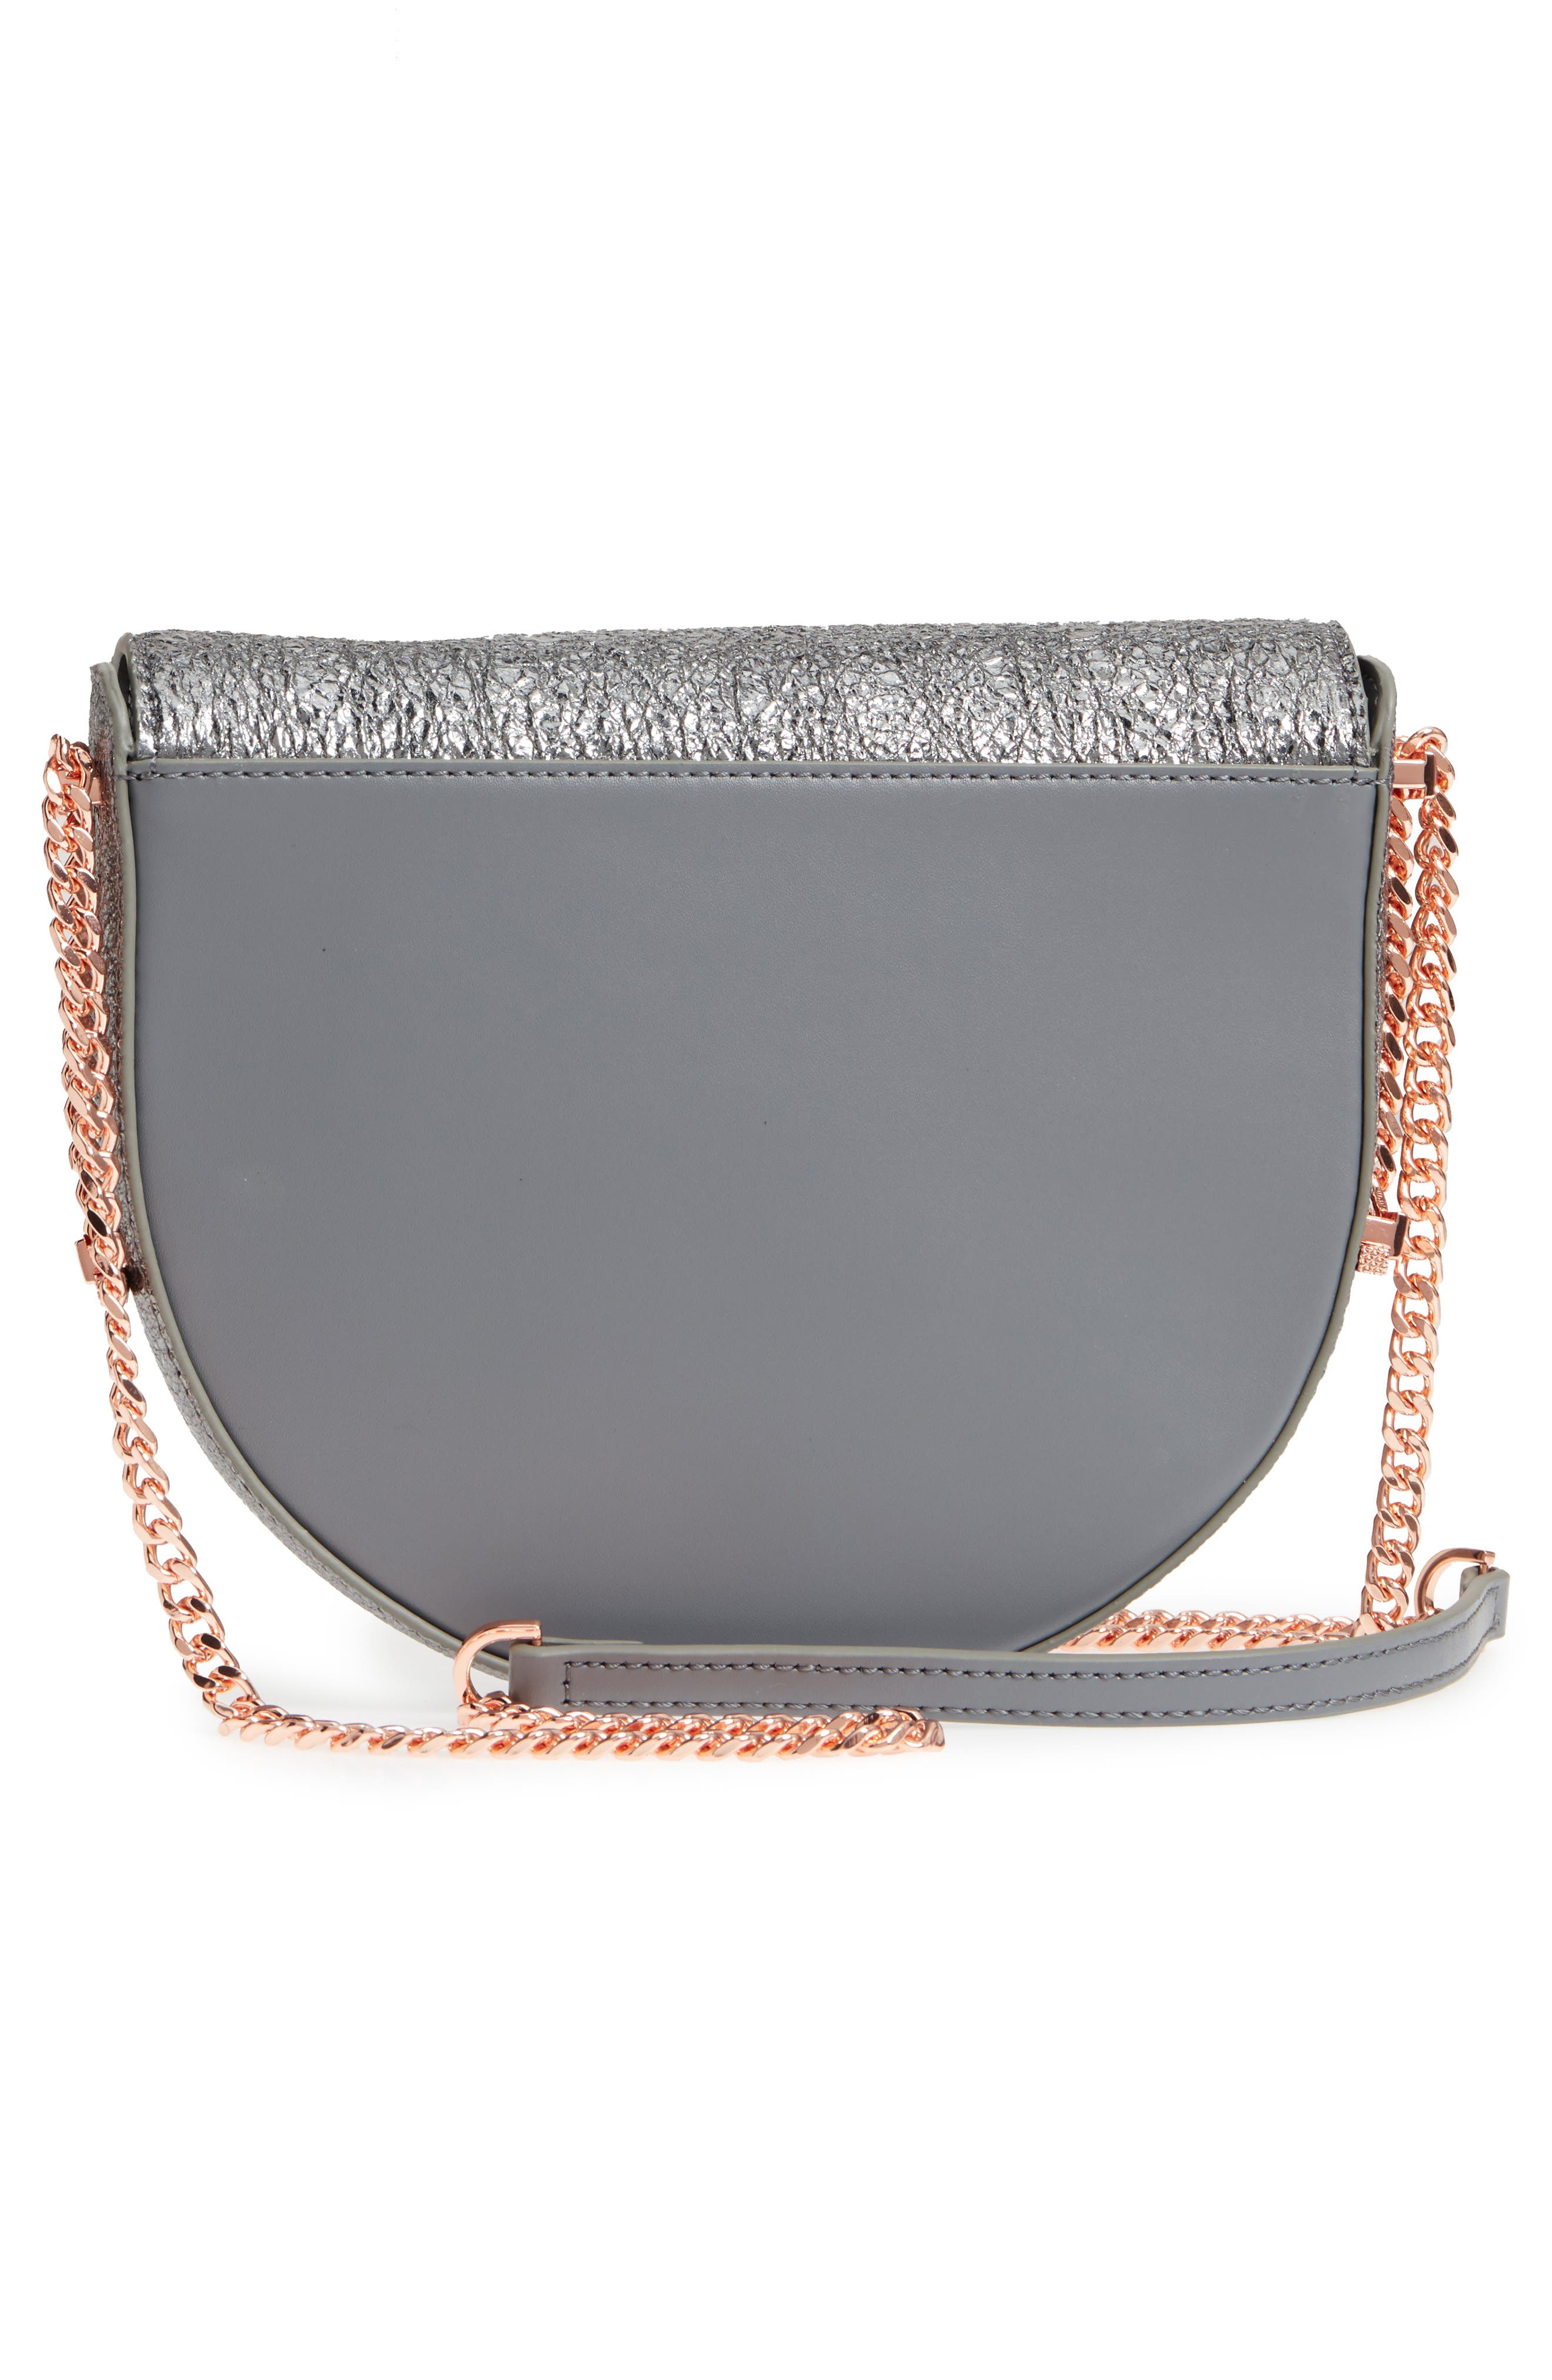 Half Moon Metallic Leather Crossbody Bag,                             Alternate thumbnail 3, color,                             Gunmetal